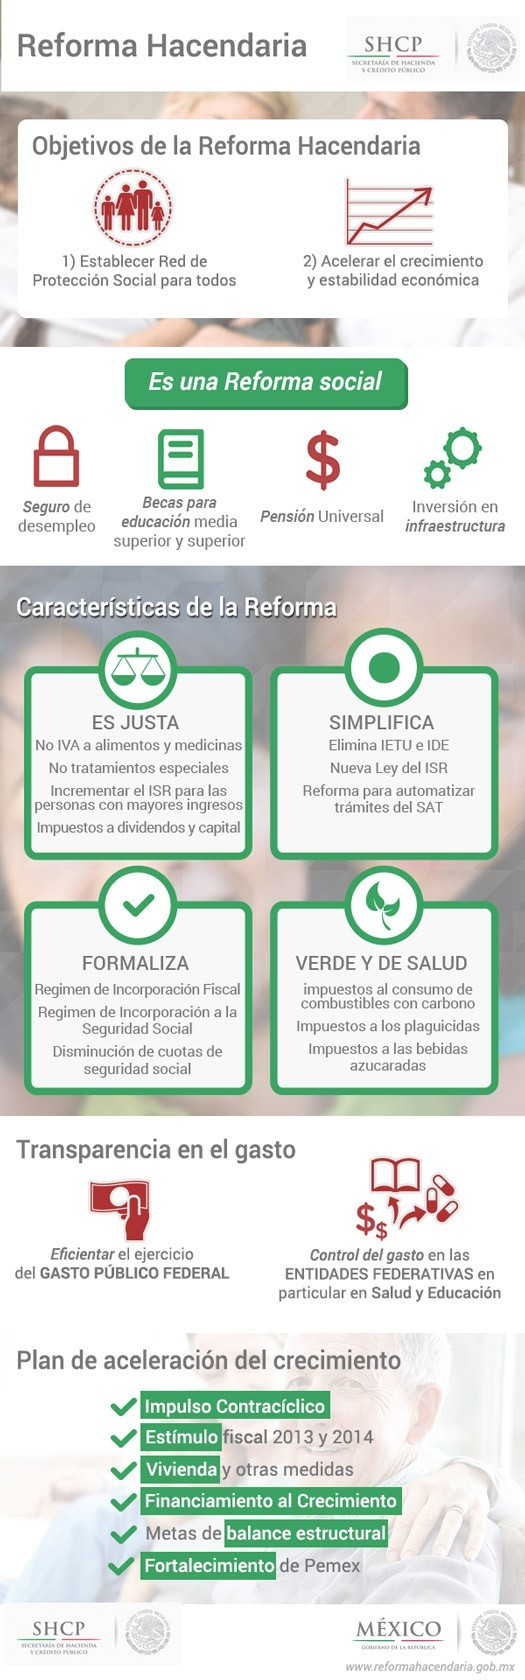 ReformaHacendaria Infografia 525px.jpg